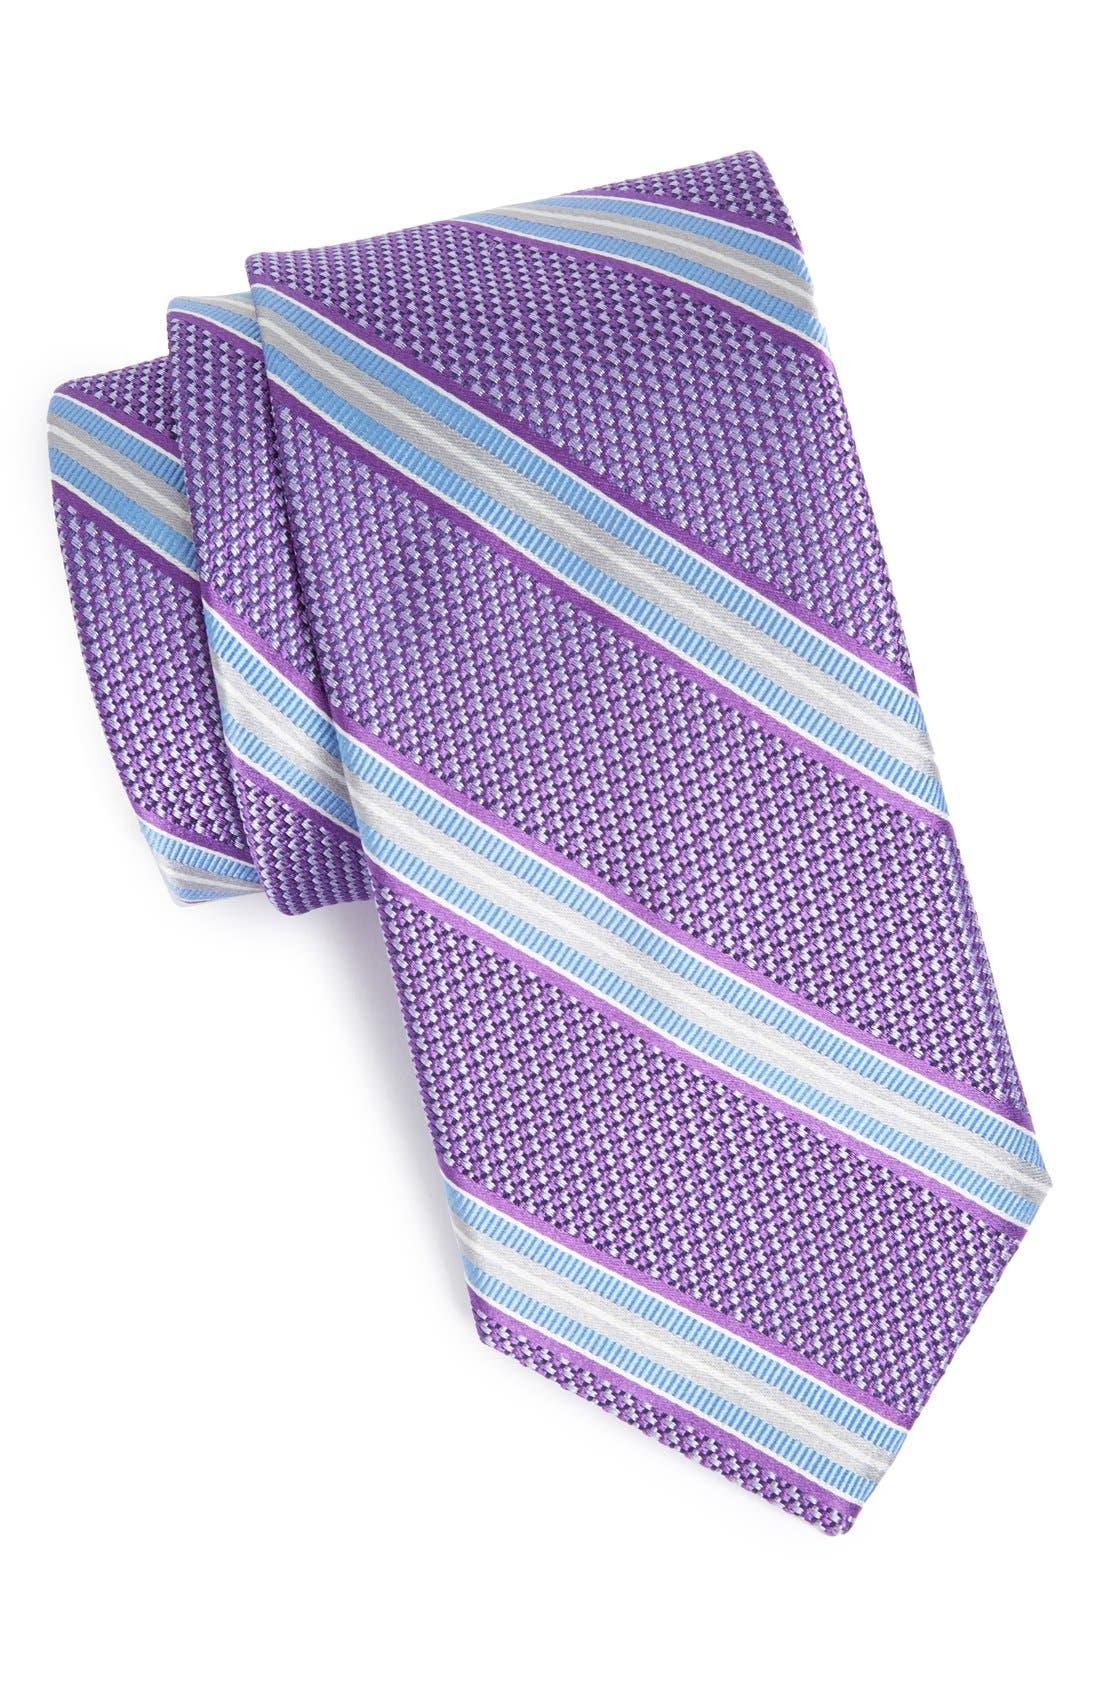 Alternate Image 1 Selected - John W. Nordstrom® 'Robinson' Woven Silk Tie